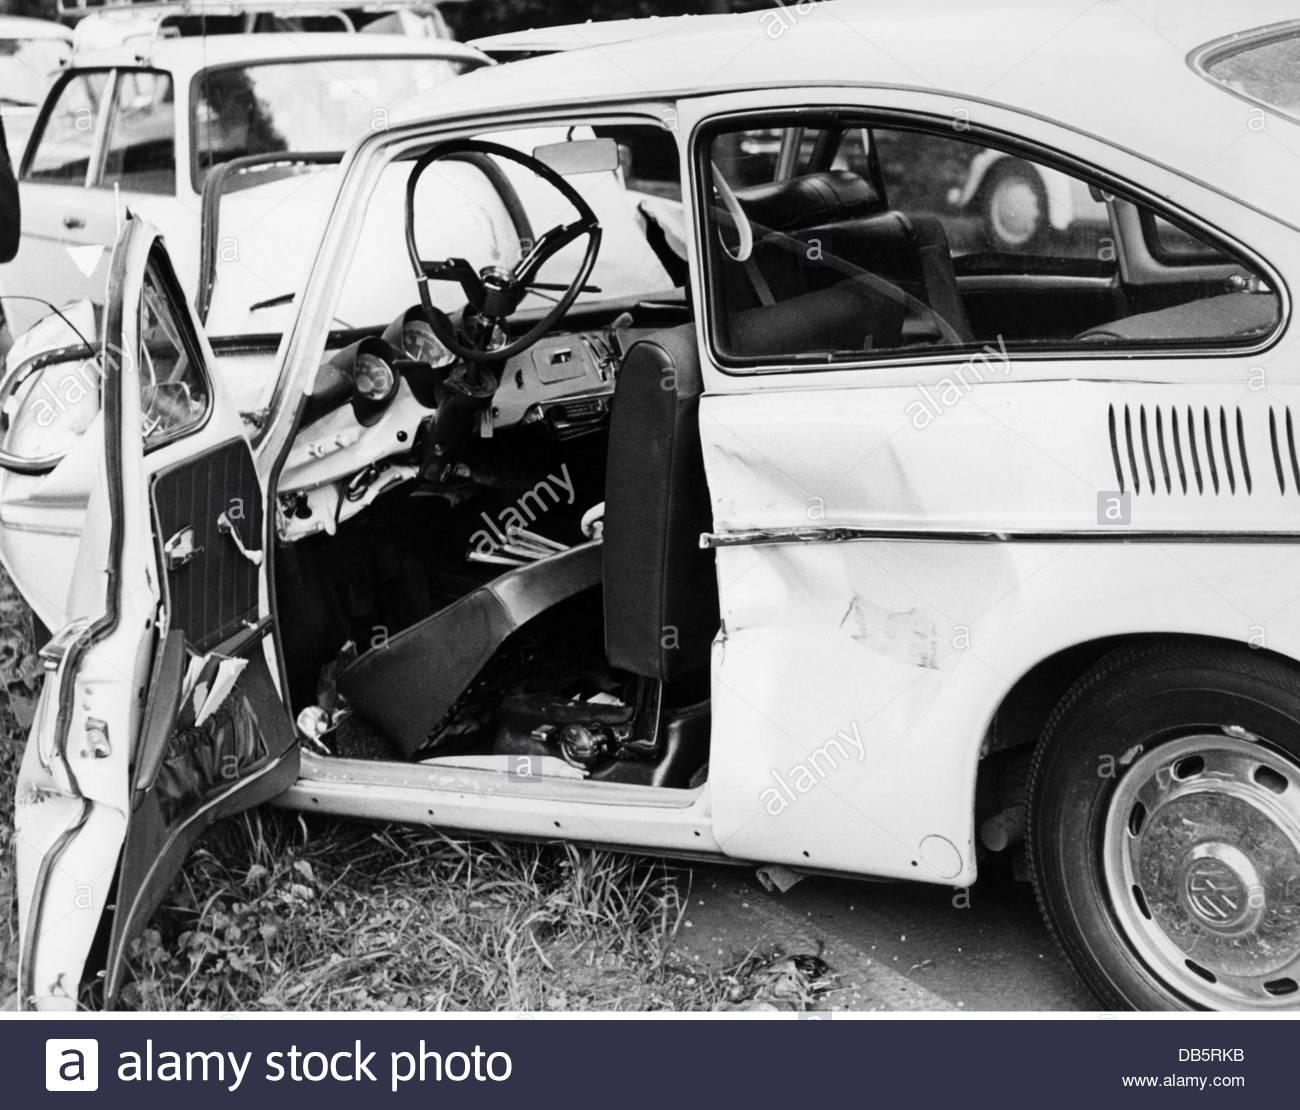 Buy Damaged Cars In Germany